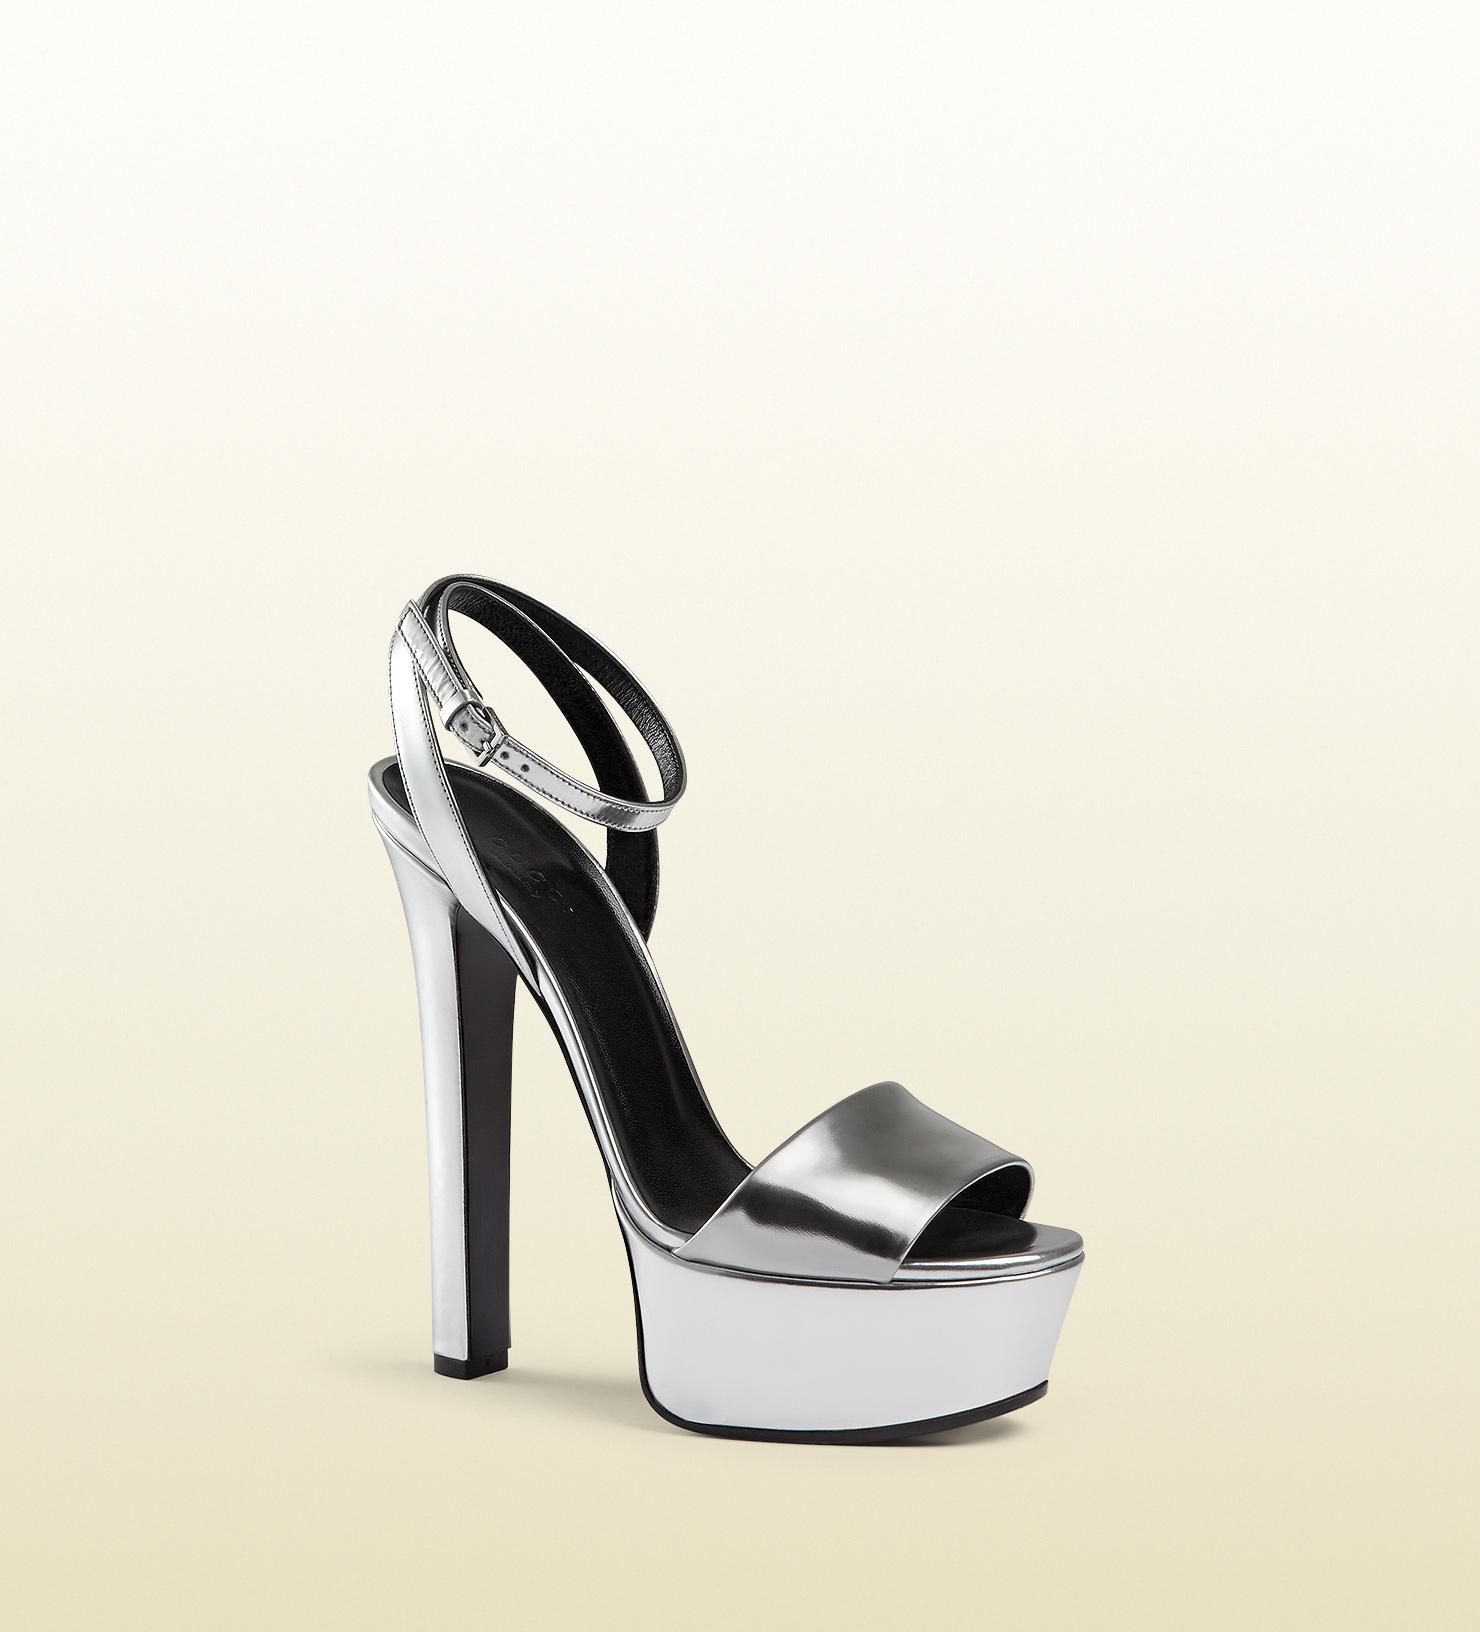 39b3e4c81db Lyst - Gucci Metallic Leather Platform Sandal in Metallic